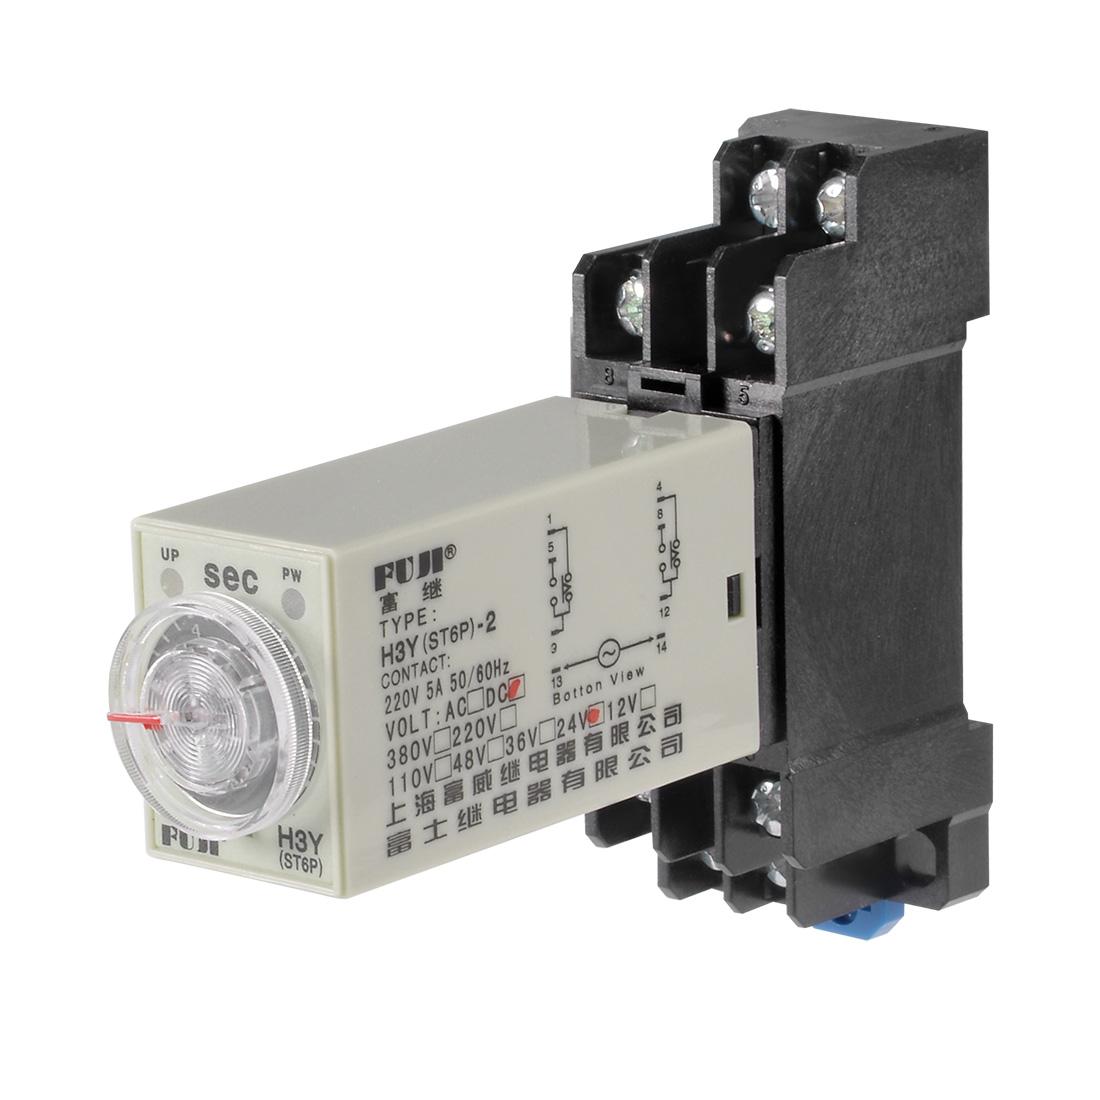 24VDC 10S 8 Terminals Range Adjustable Delay Timer Time Relay H3Y-2 w base